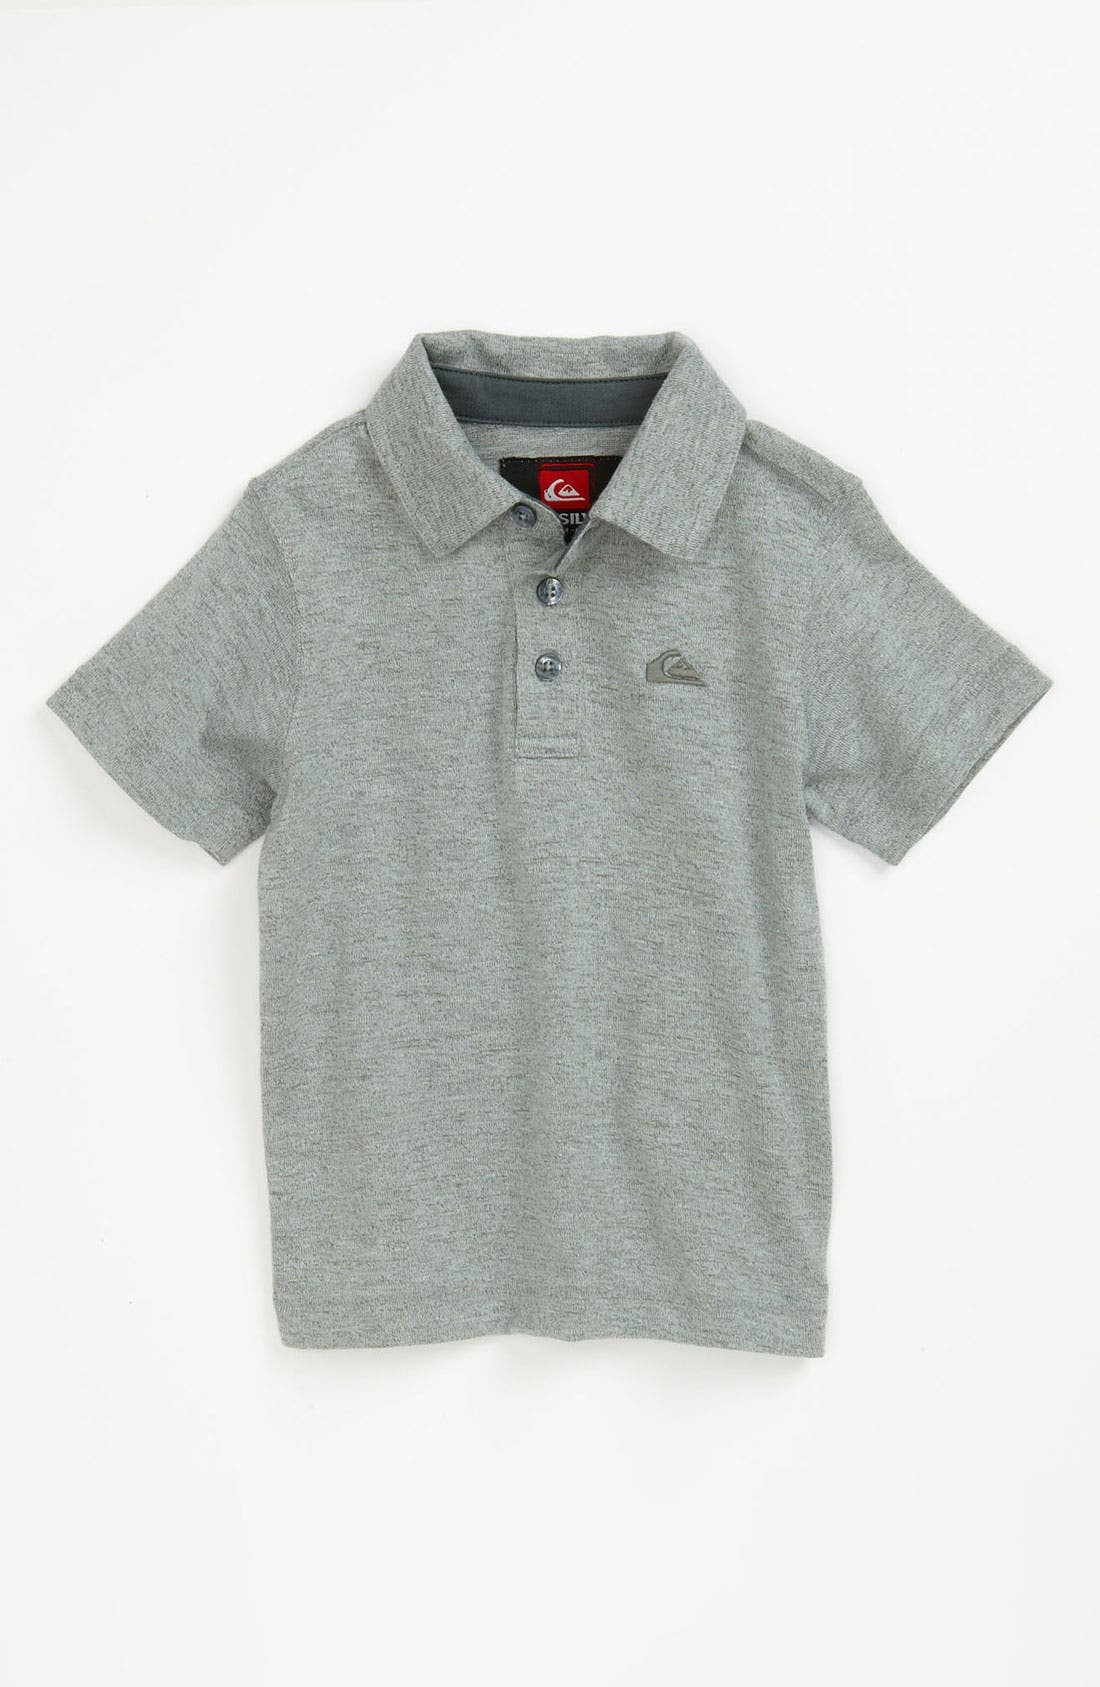 Main Image - Quiksilver 'Grab Bag' Polo Shirt (Baby)